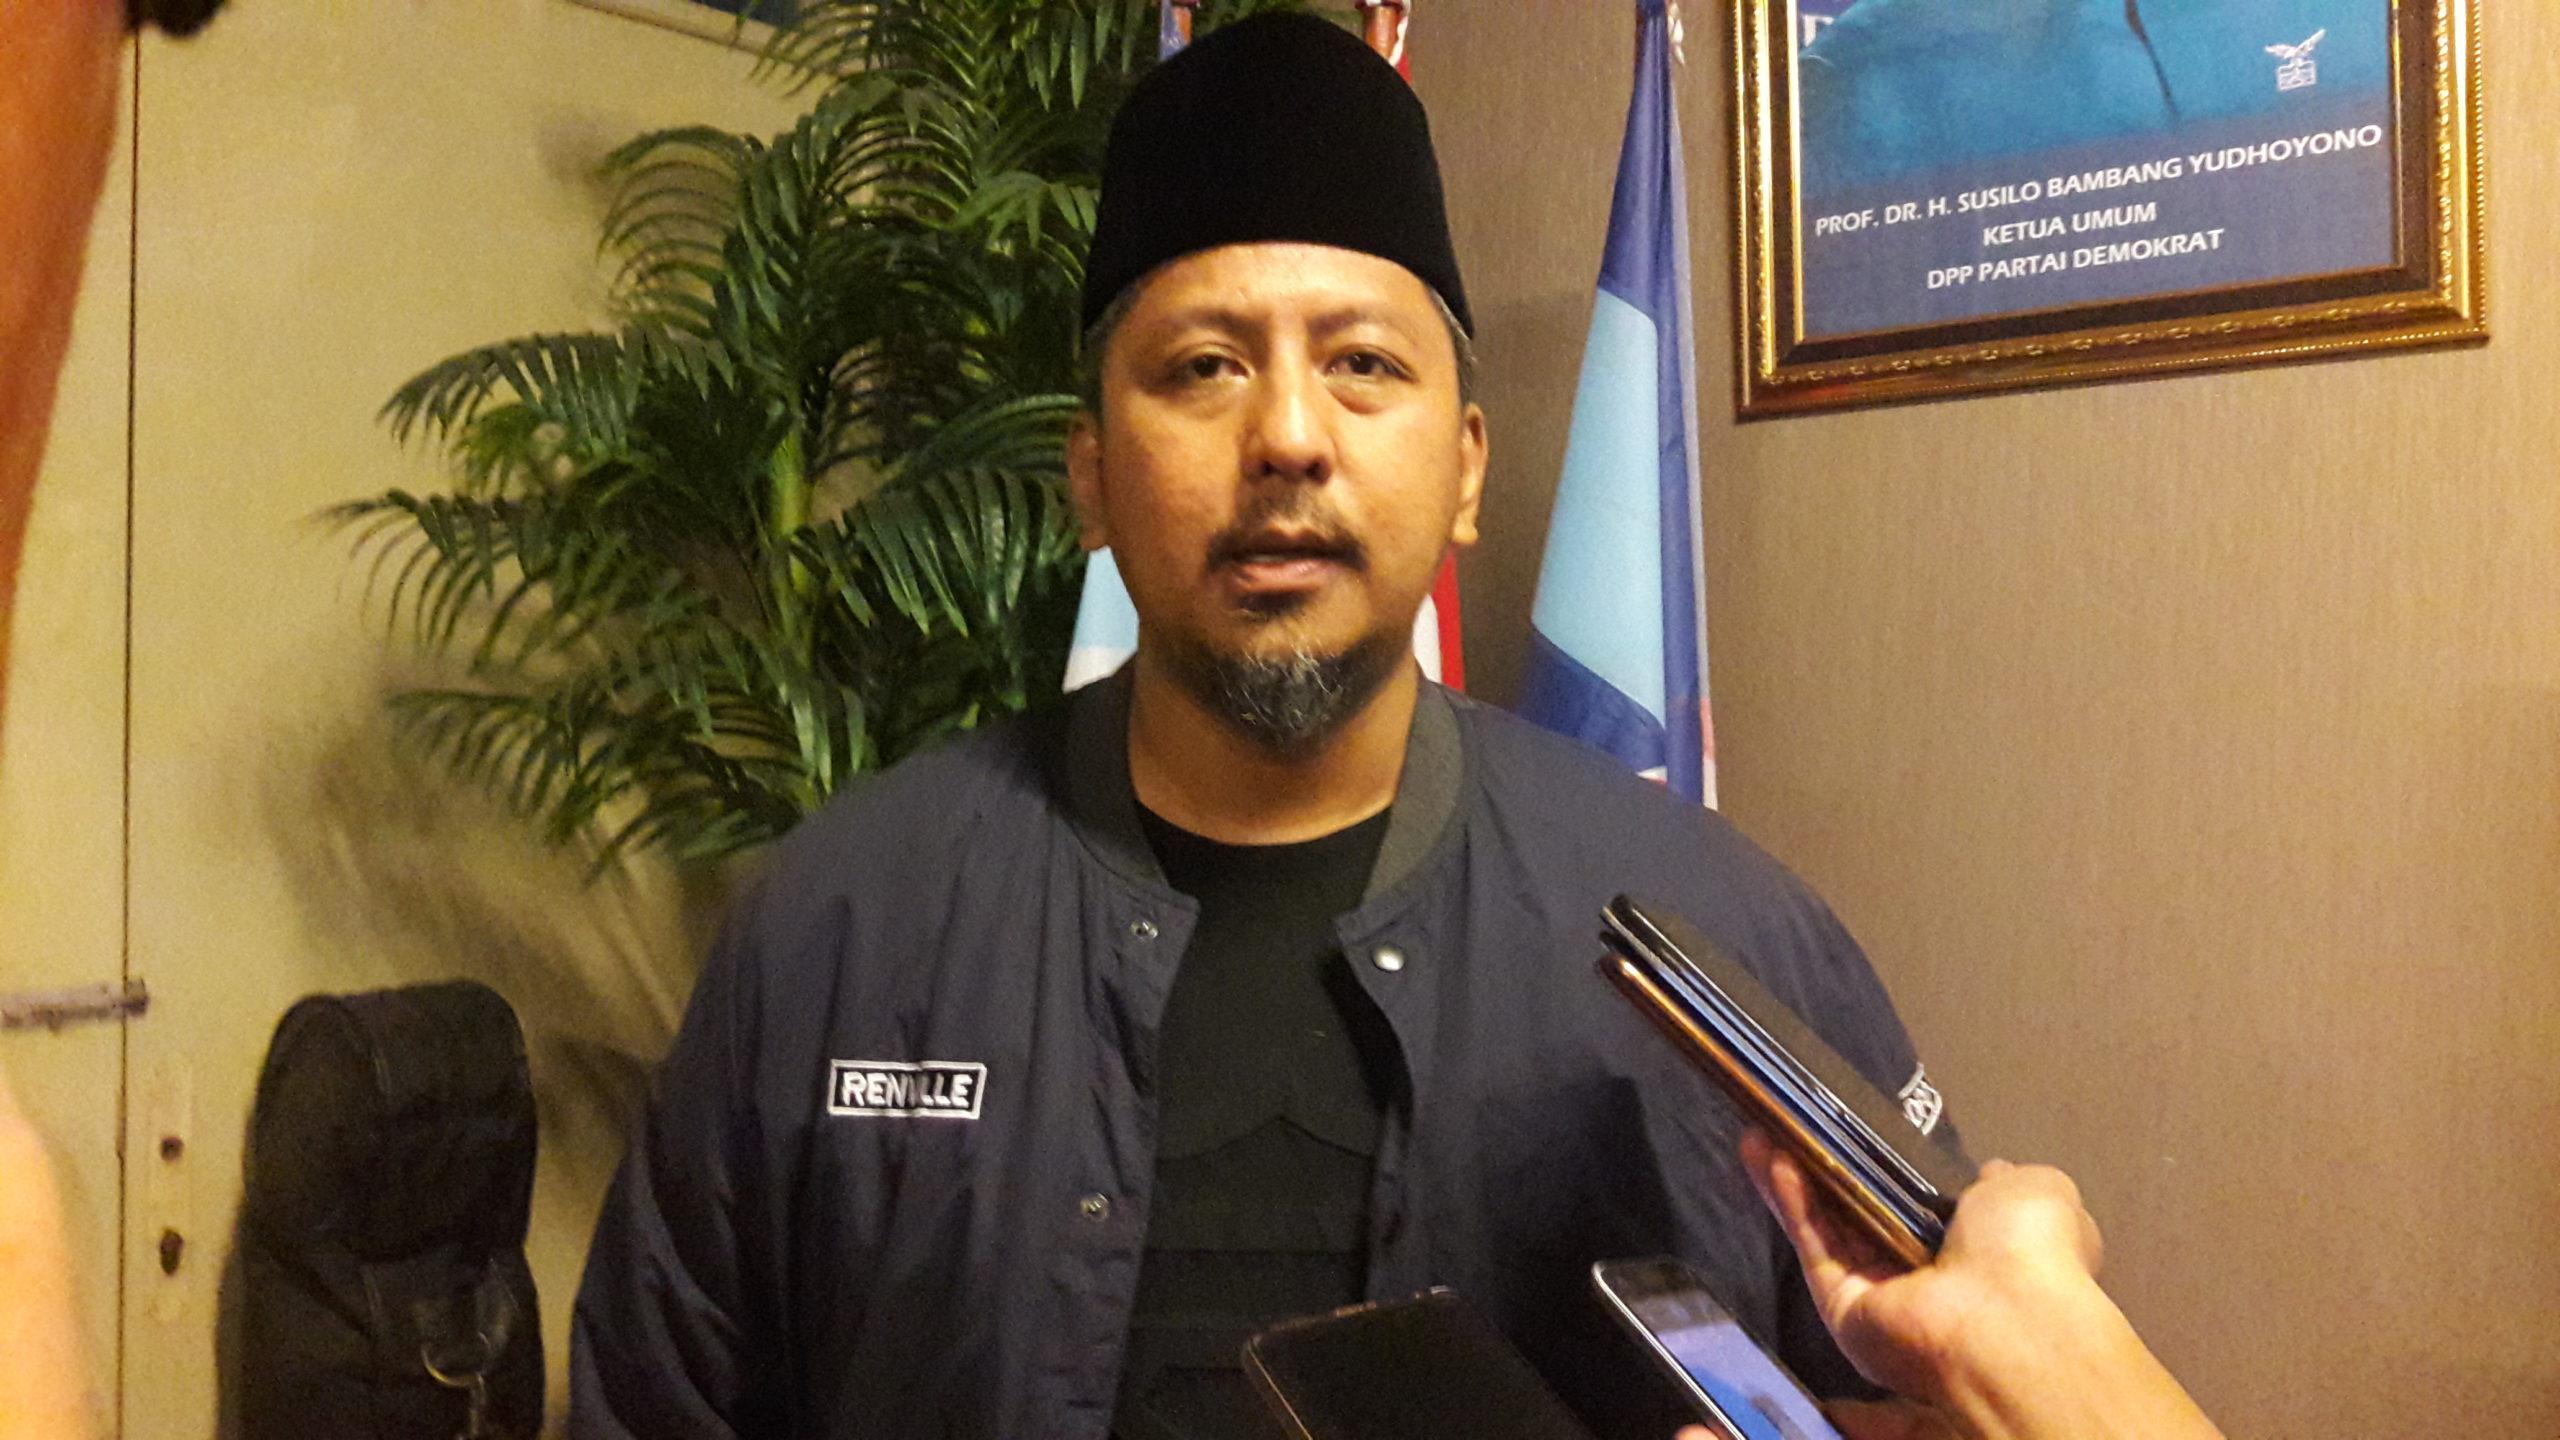 Plt Ketua DPD Partai Demokrat Jatim Renville Antonio